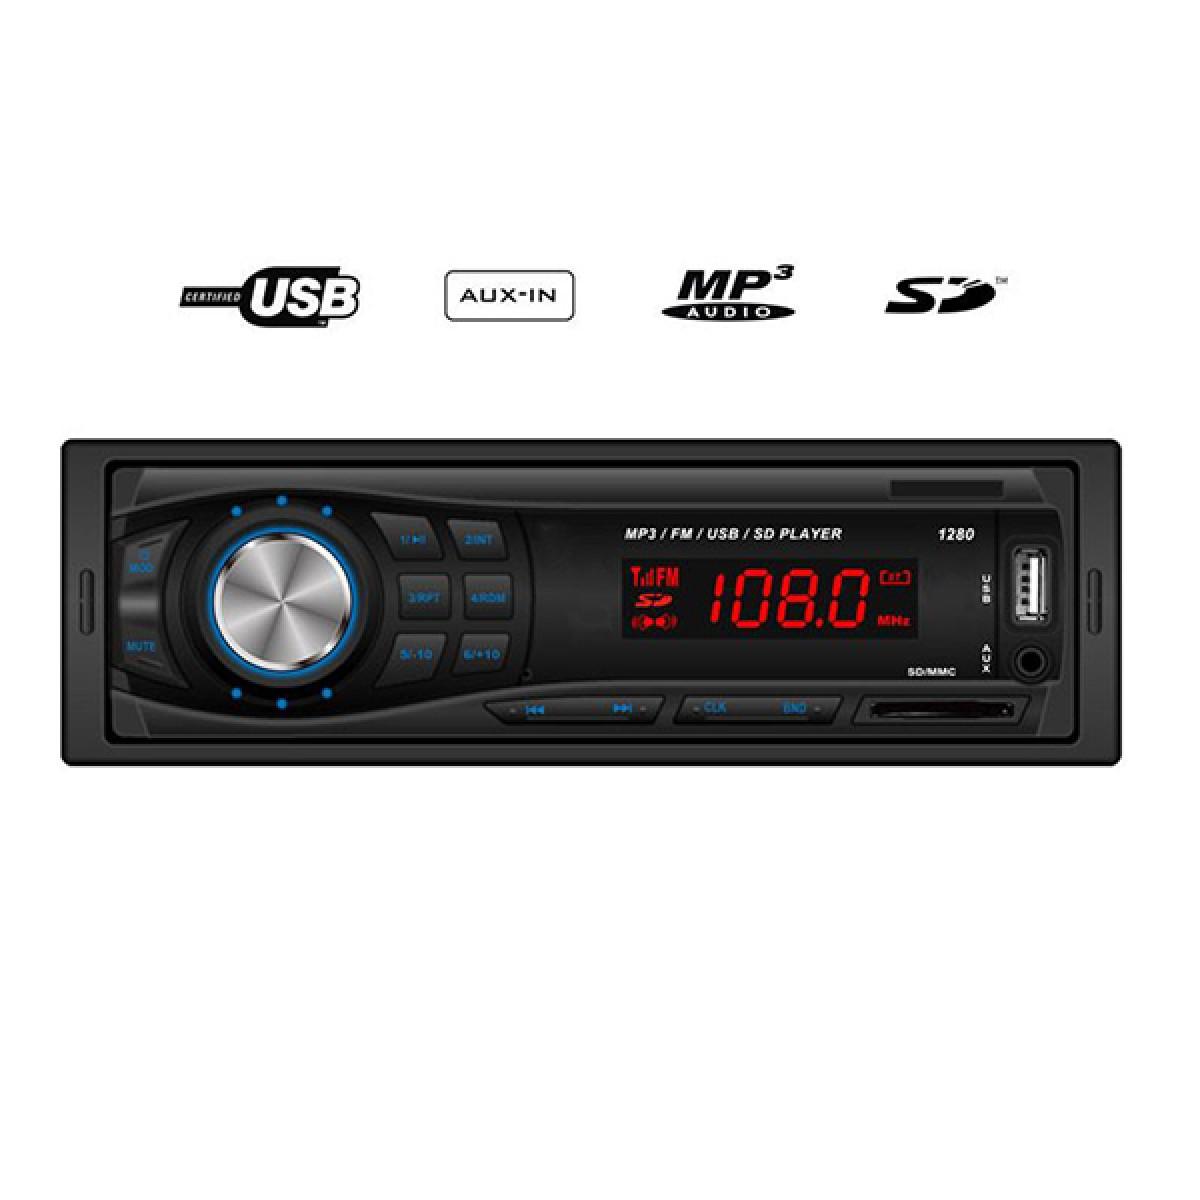 MP3 player αυτοκινήτου με είσοδο USB/SD/AUX, ραδιόφωνο και χειριστήριο - Hi-Tech GT 1280